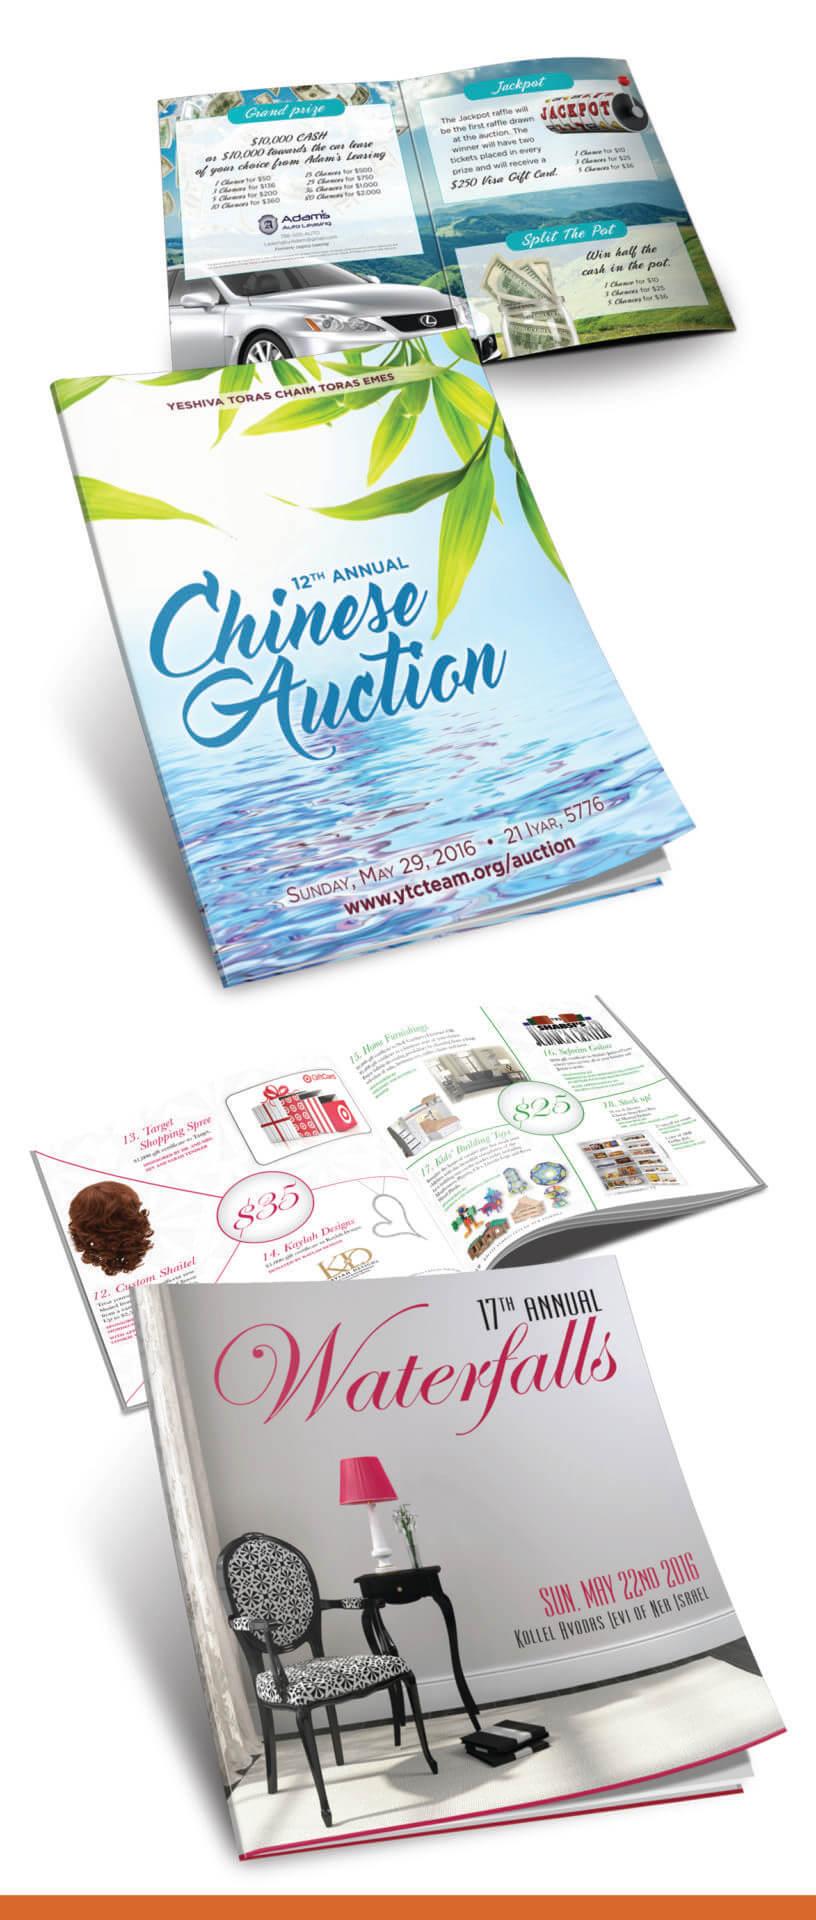 Auction Journals